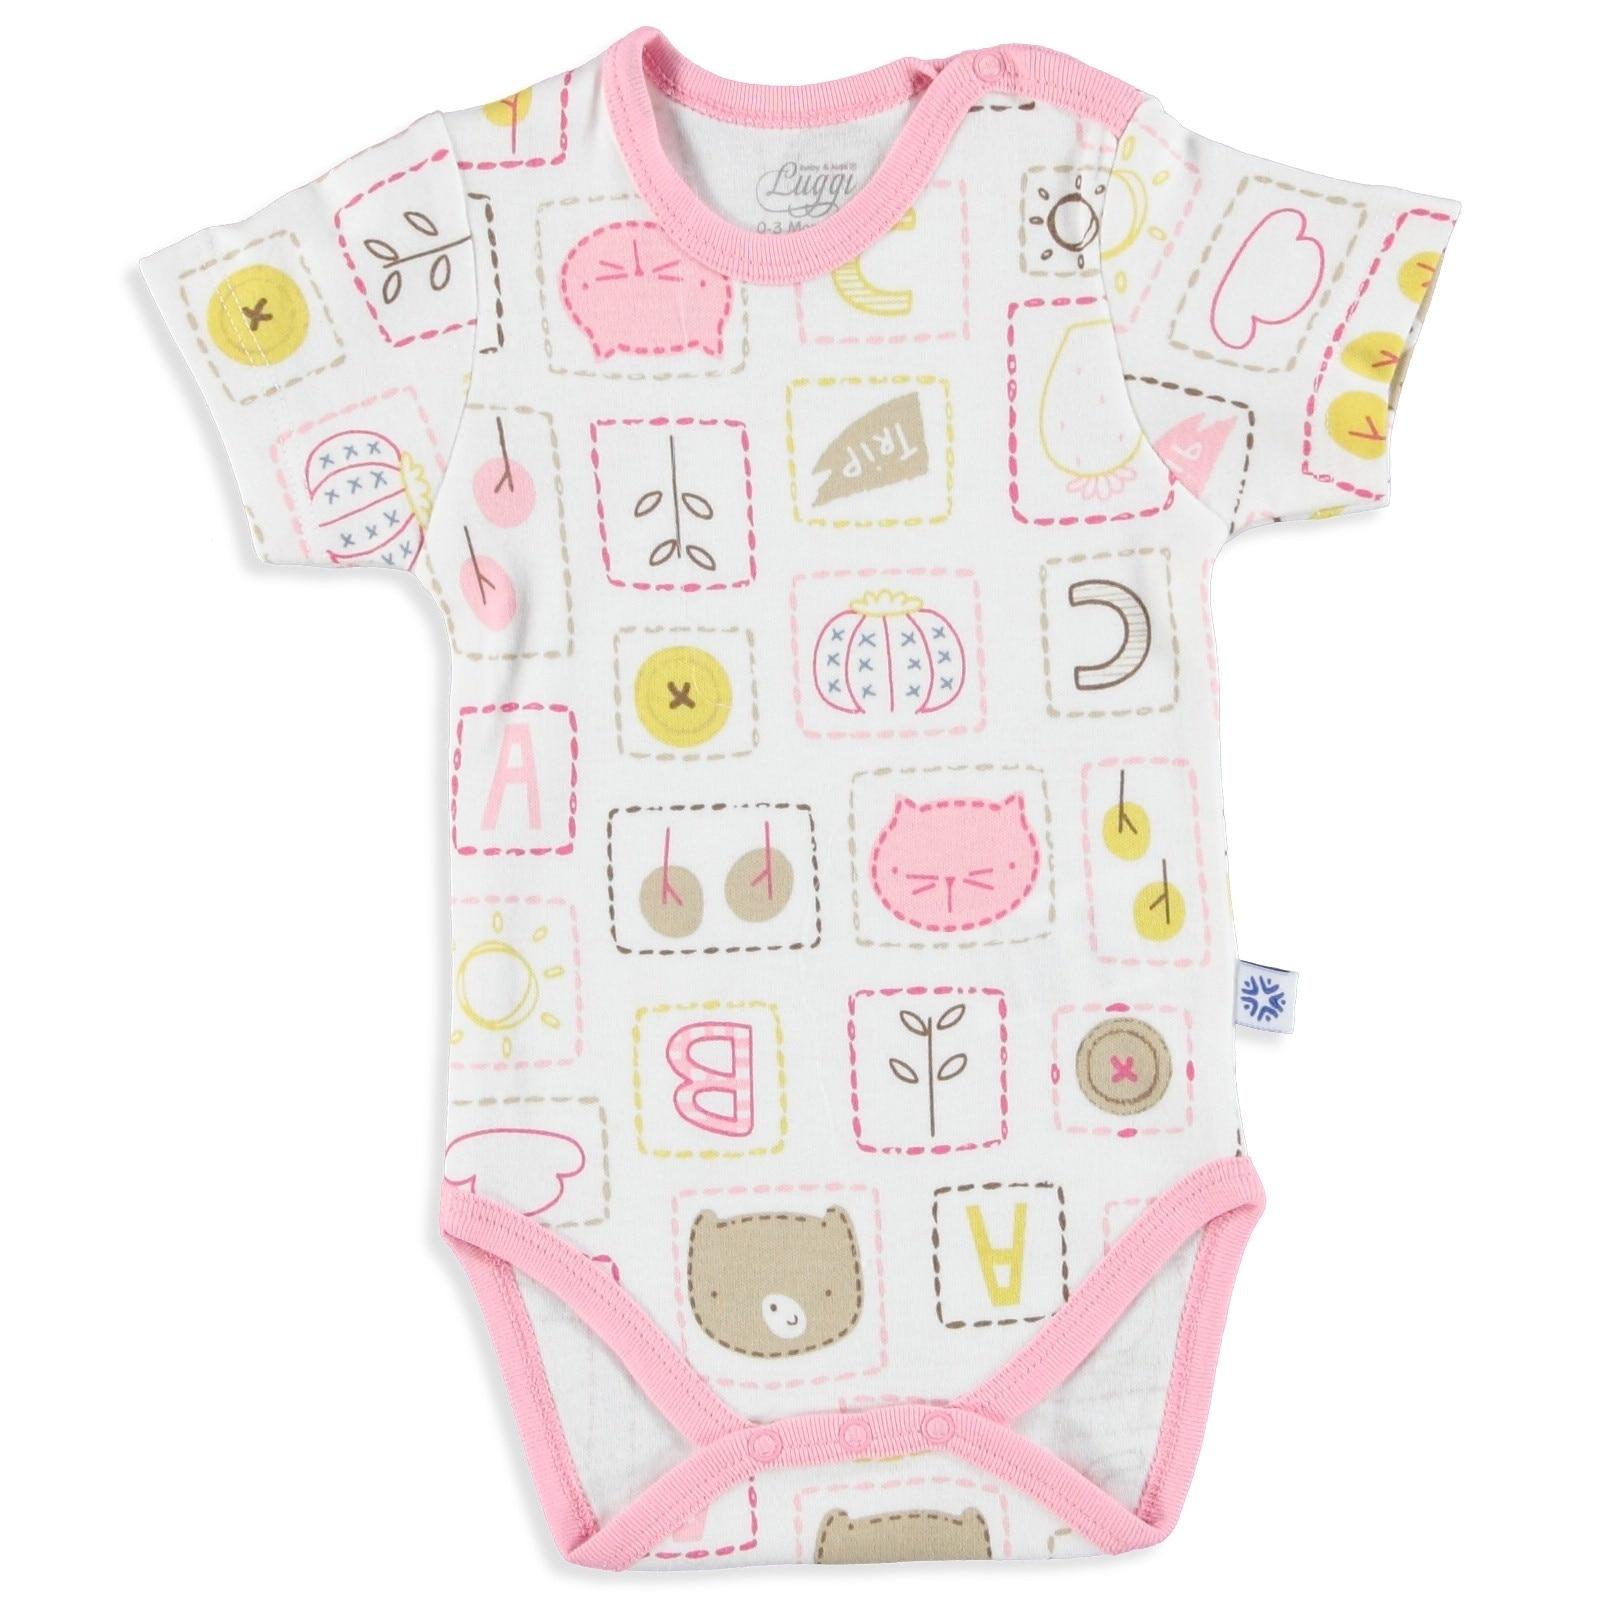 Ebebek Luggi Summer Baby Girl Friends Short Sleeve Bodysuit